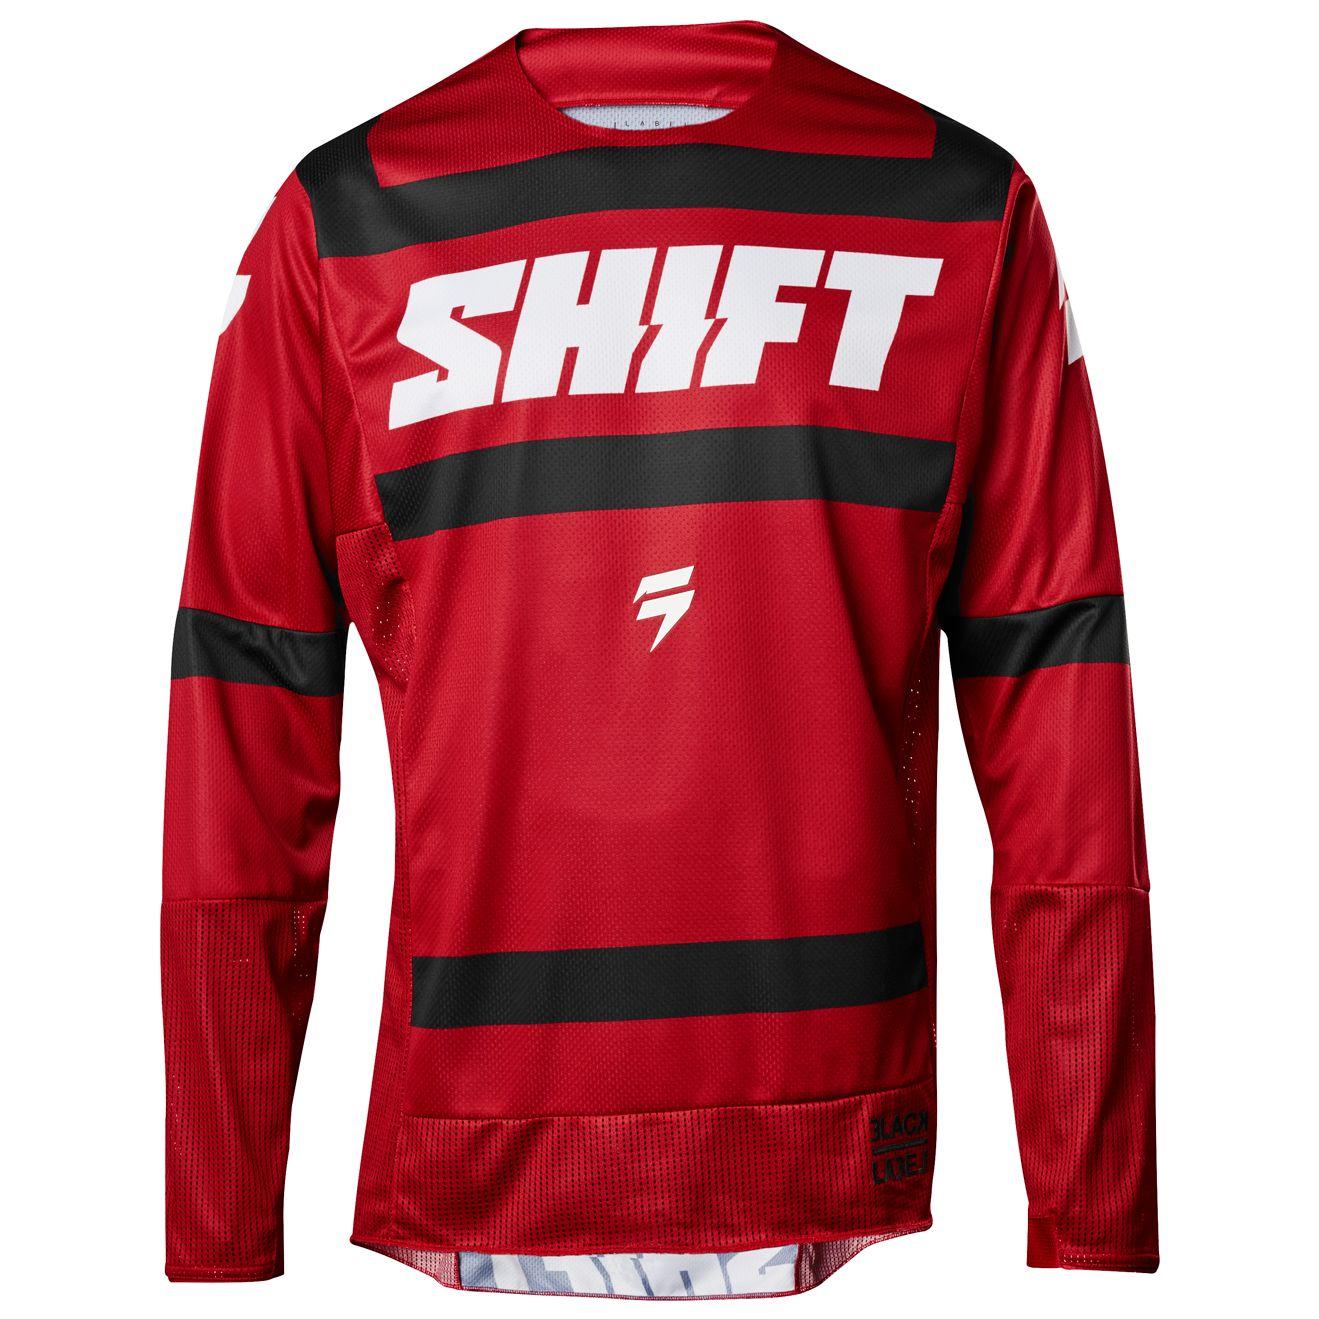 maillot cross shift black strike rouge fonce 2018 tenue cross. Black Bedroom Furniture Sets. Home Design Ideas